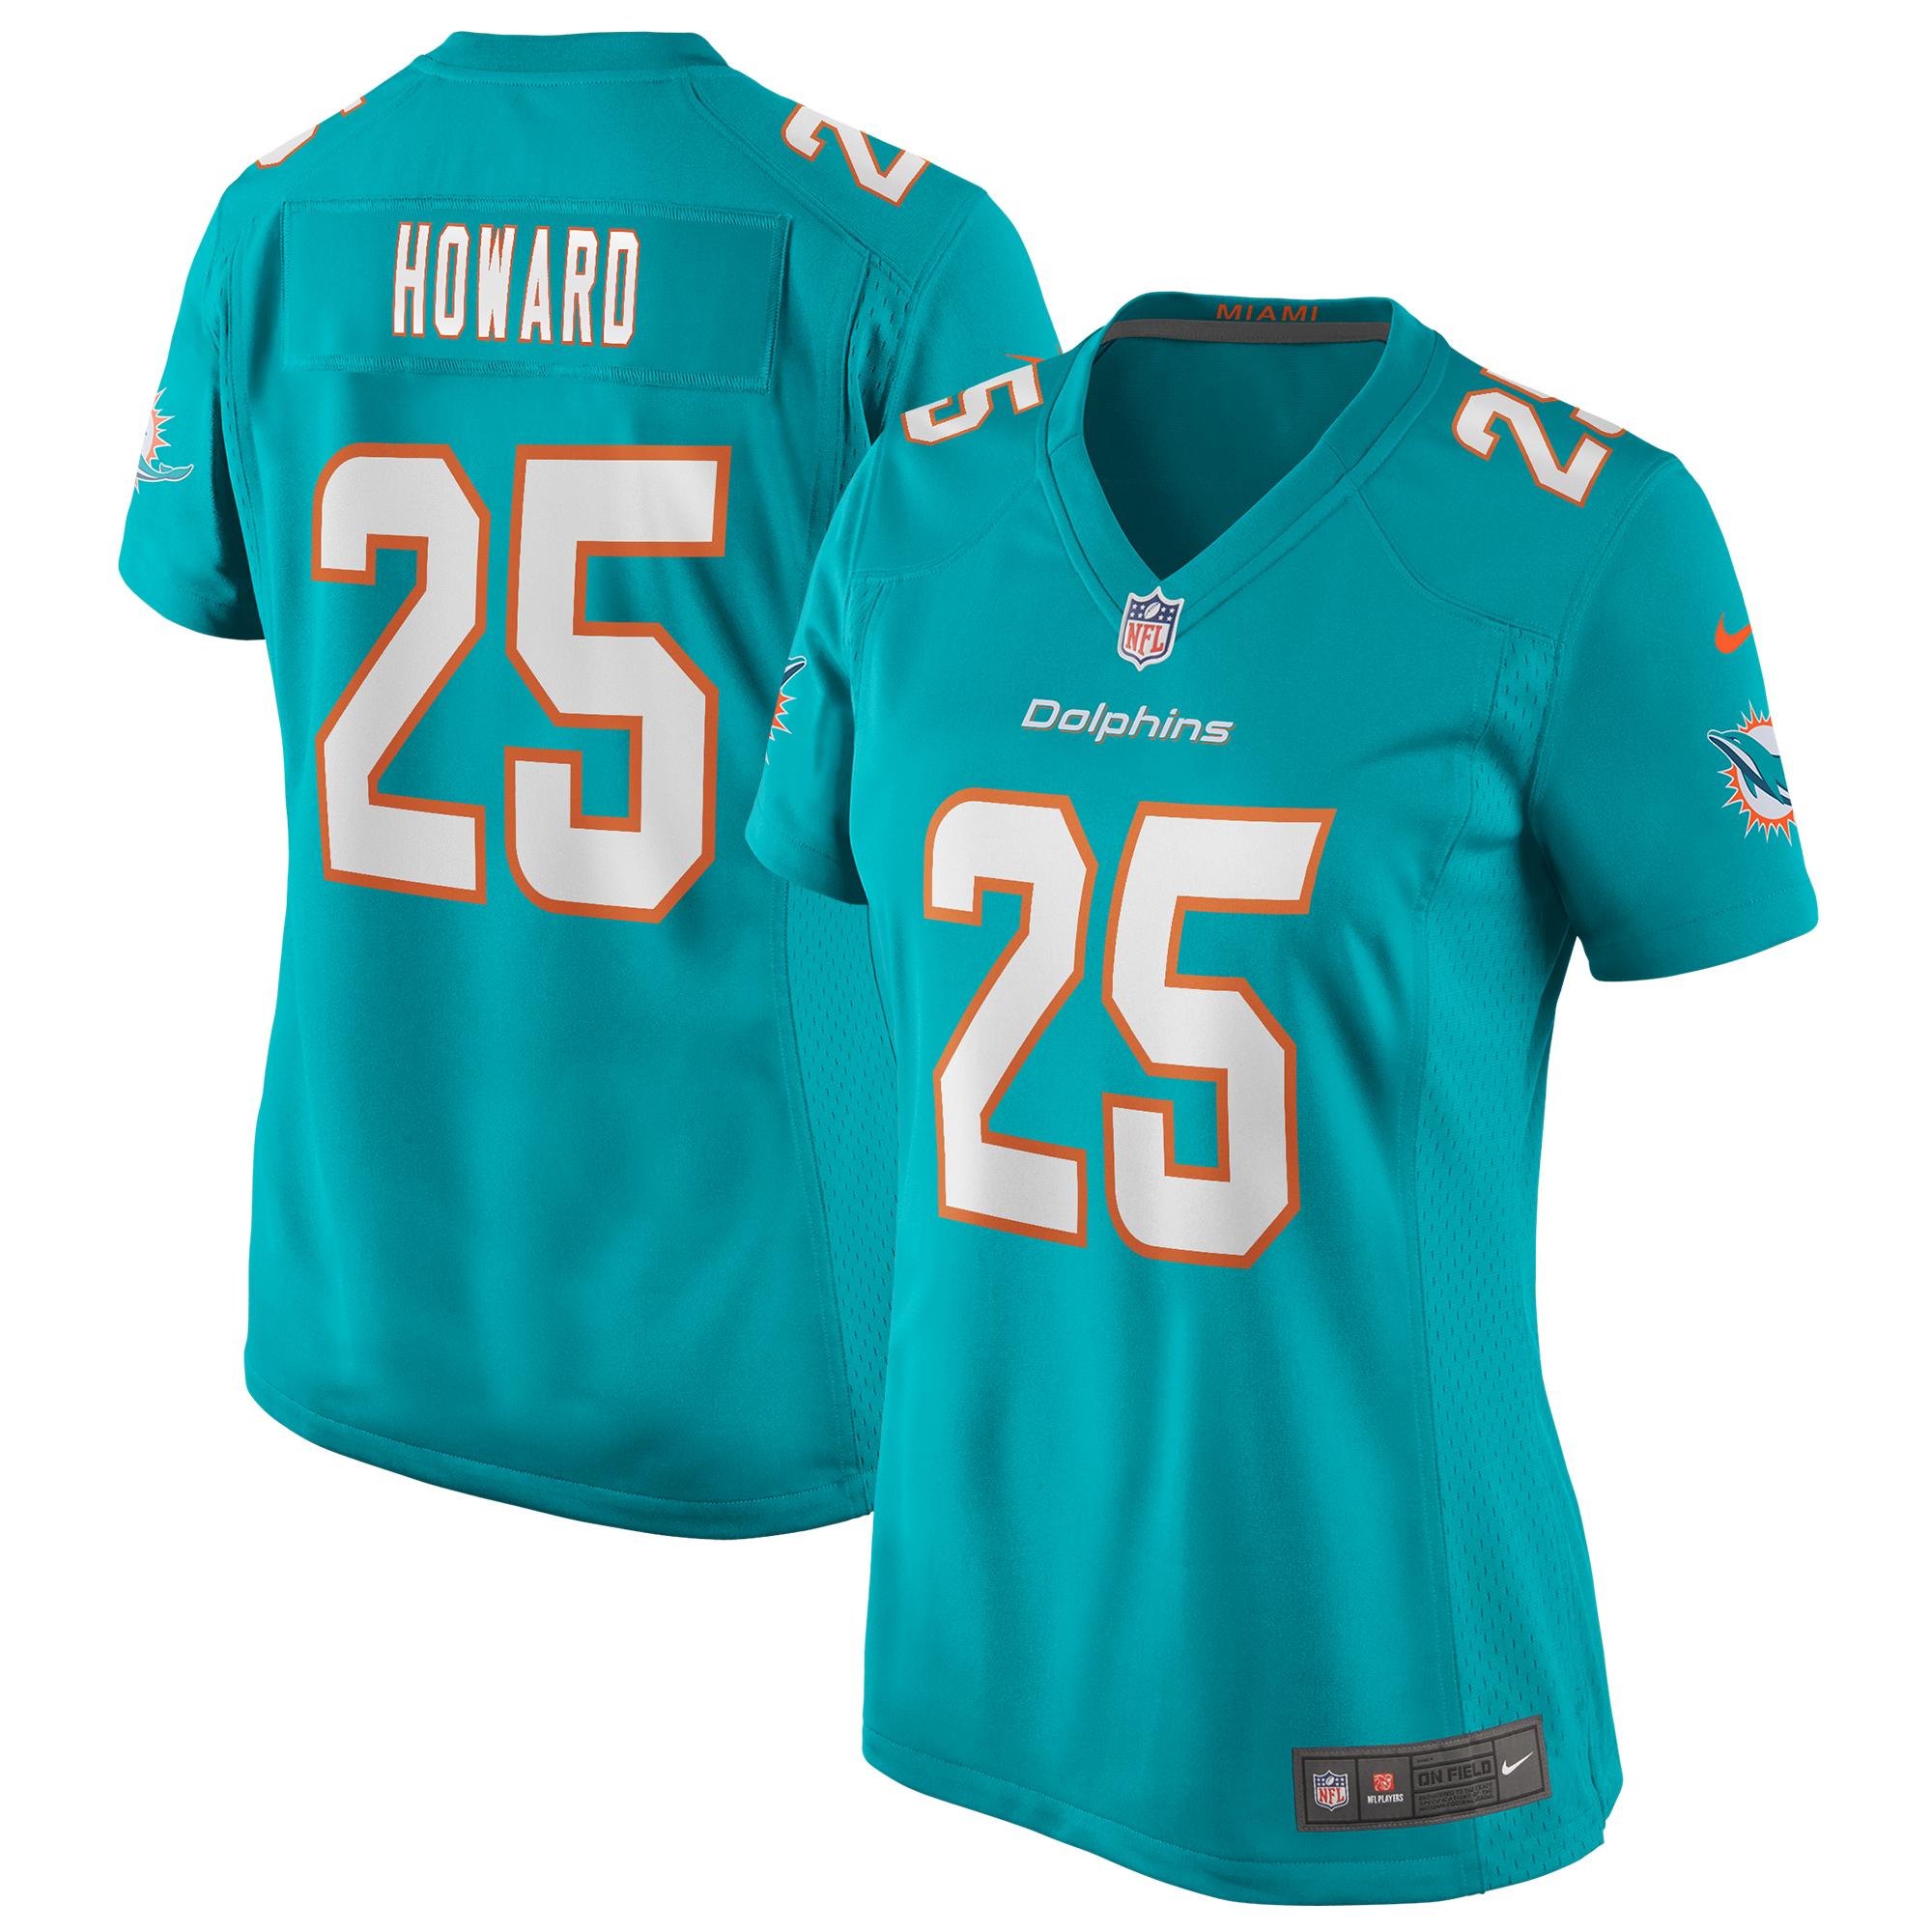 Xavien Howard Miami Dolphins Nike Women's Game Jersey - Aqua